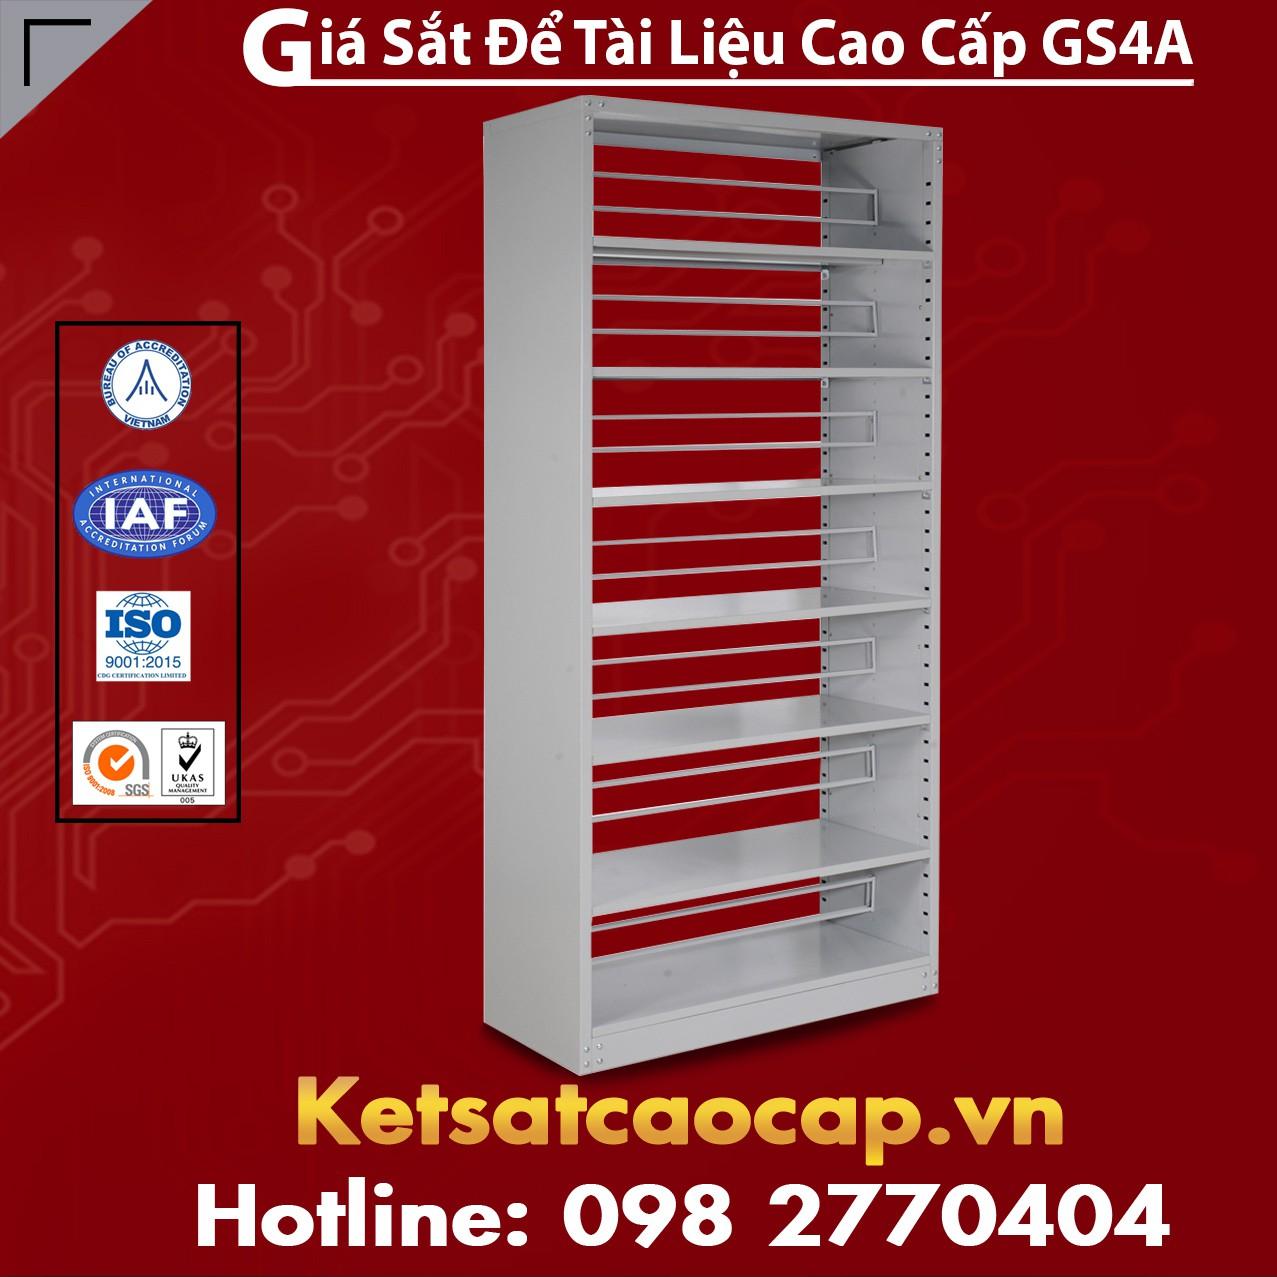 Giá Sắt GS4A